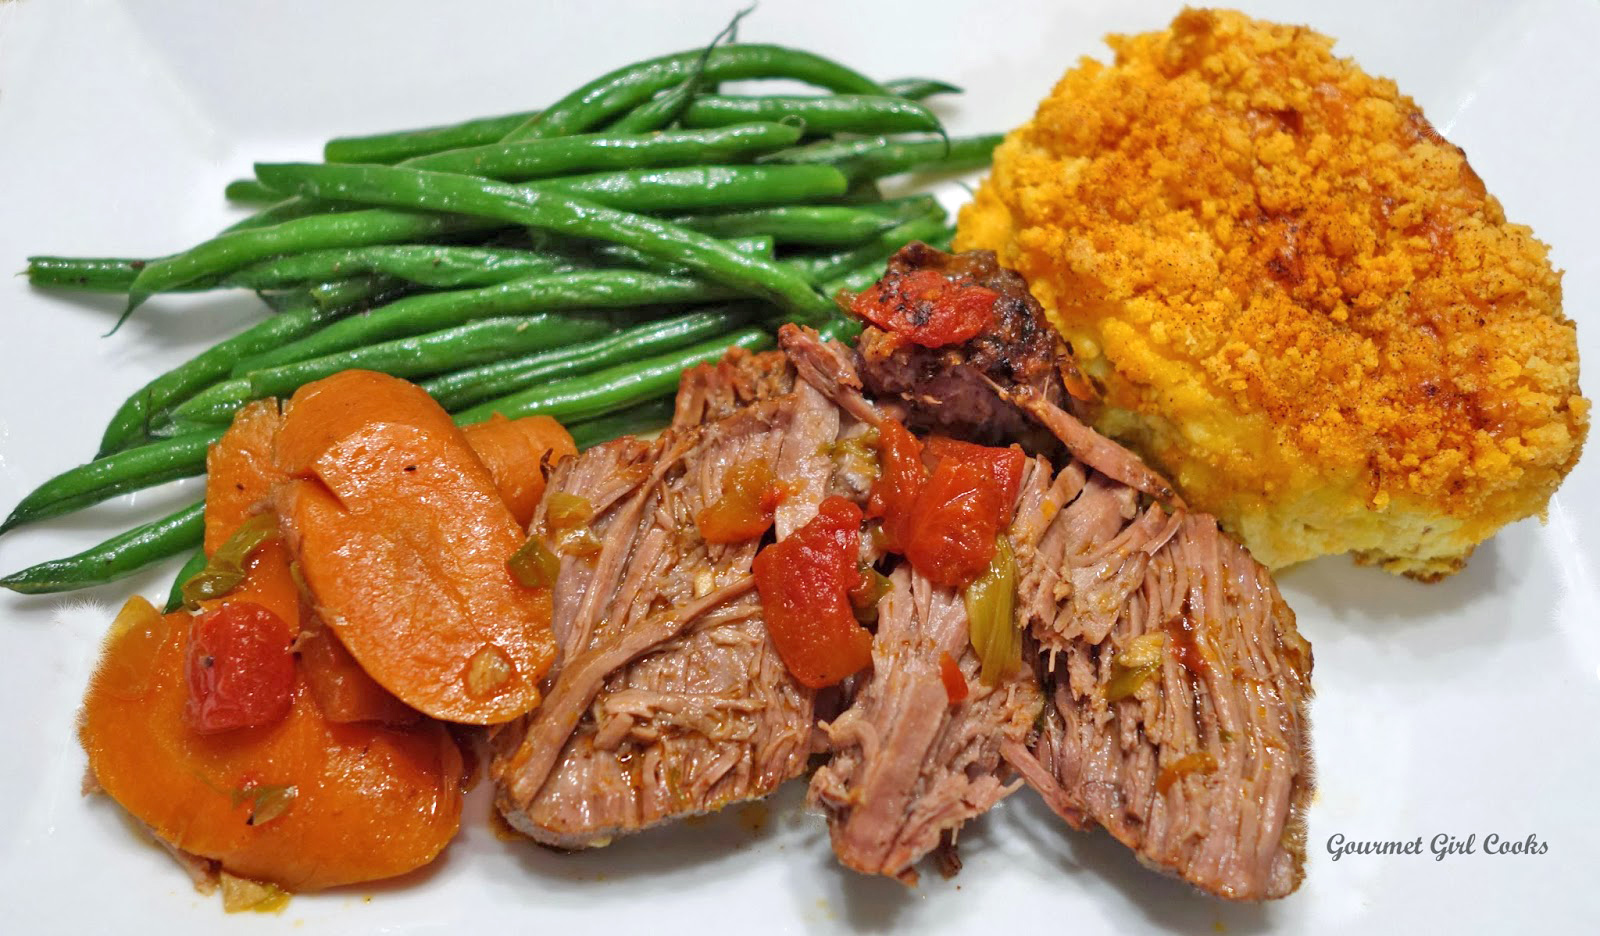 Gourmet Girl Cooks: Pot Roast -- Slow Roasted Southwestern Style